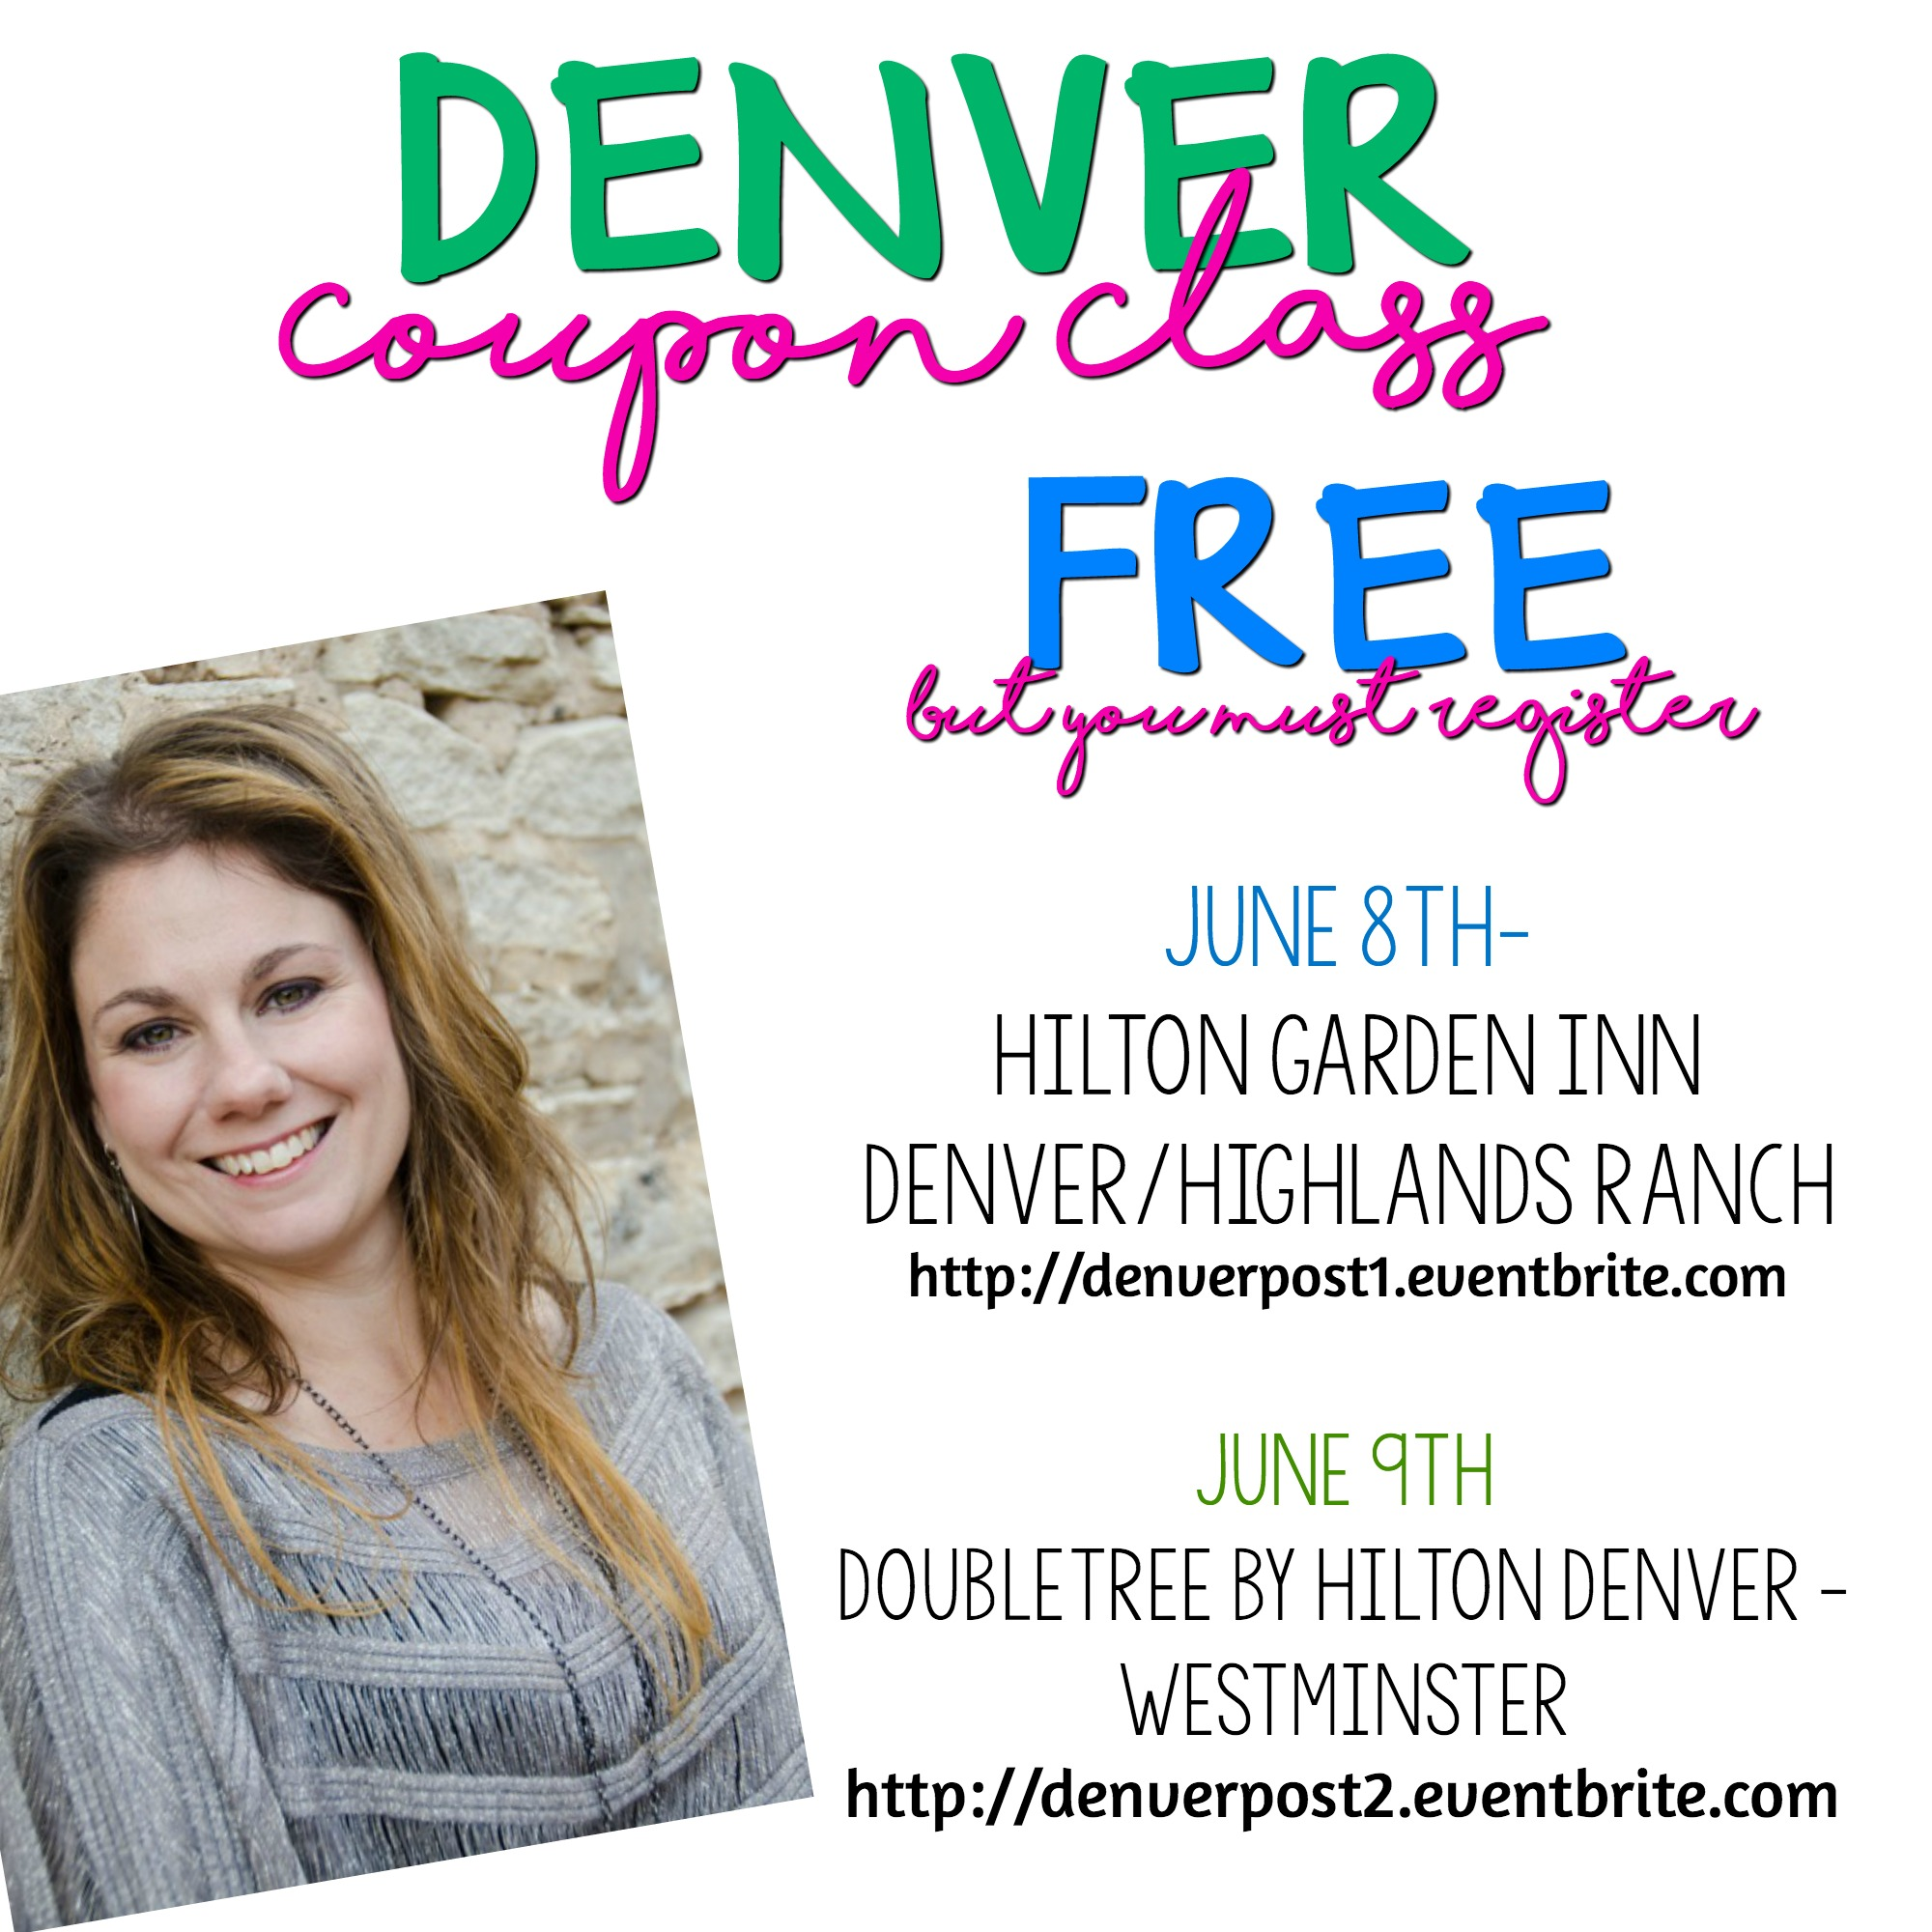 Denver Co. FREE Extreme Coupon Classes